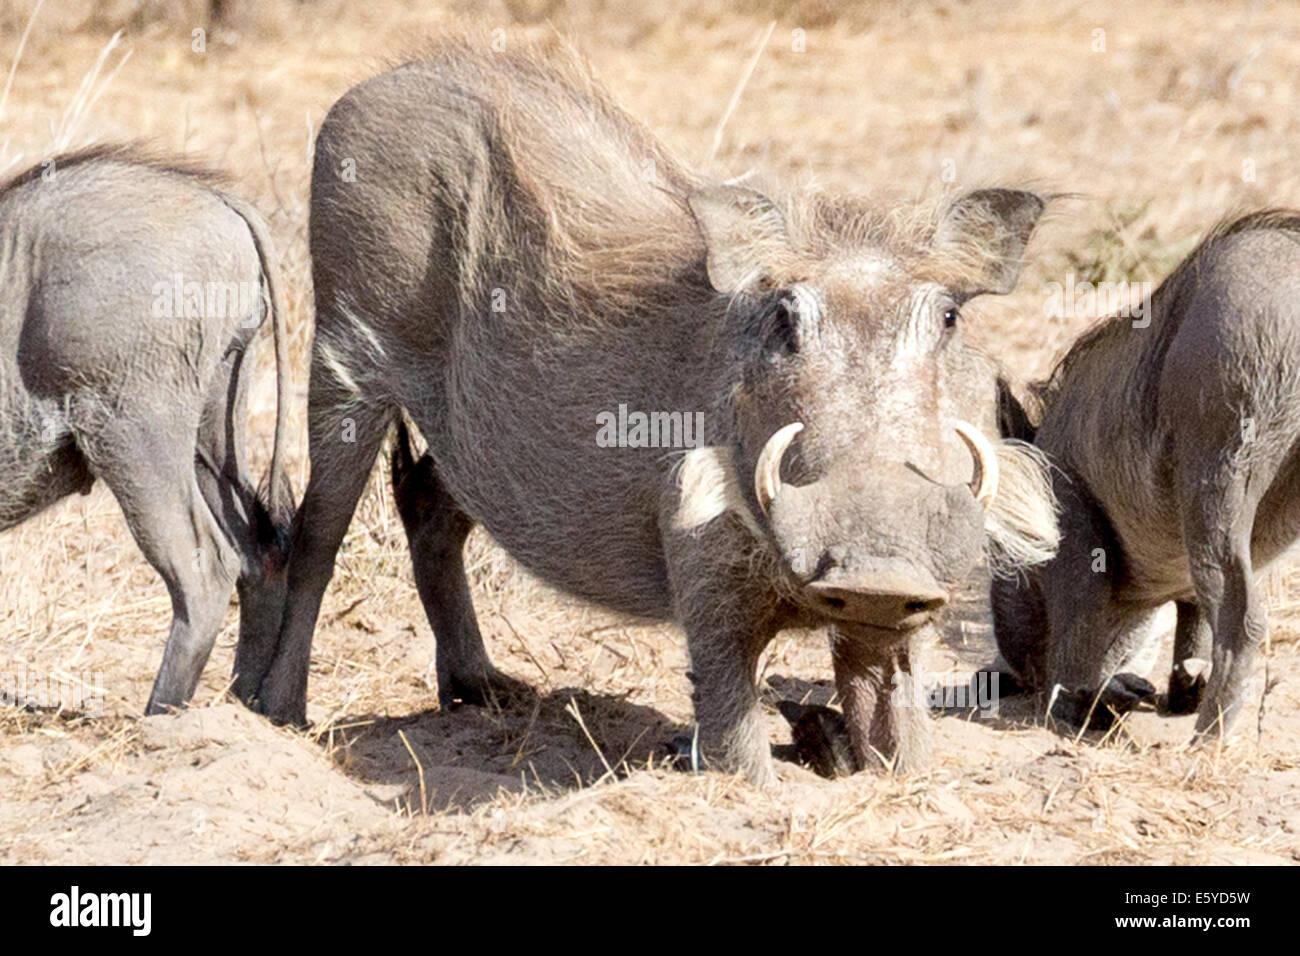 wart hogs Langue de Barbarie National park Senegal - Stock Image